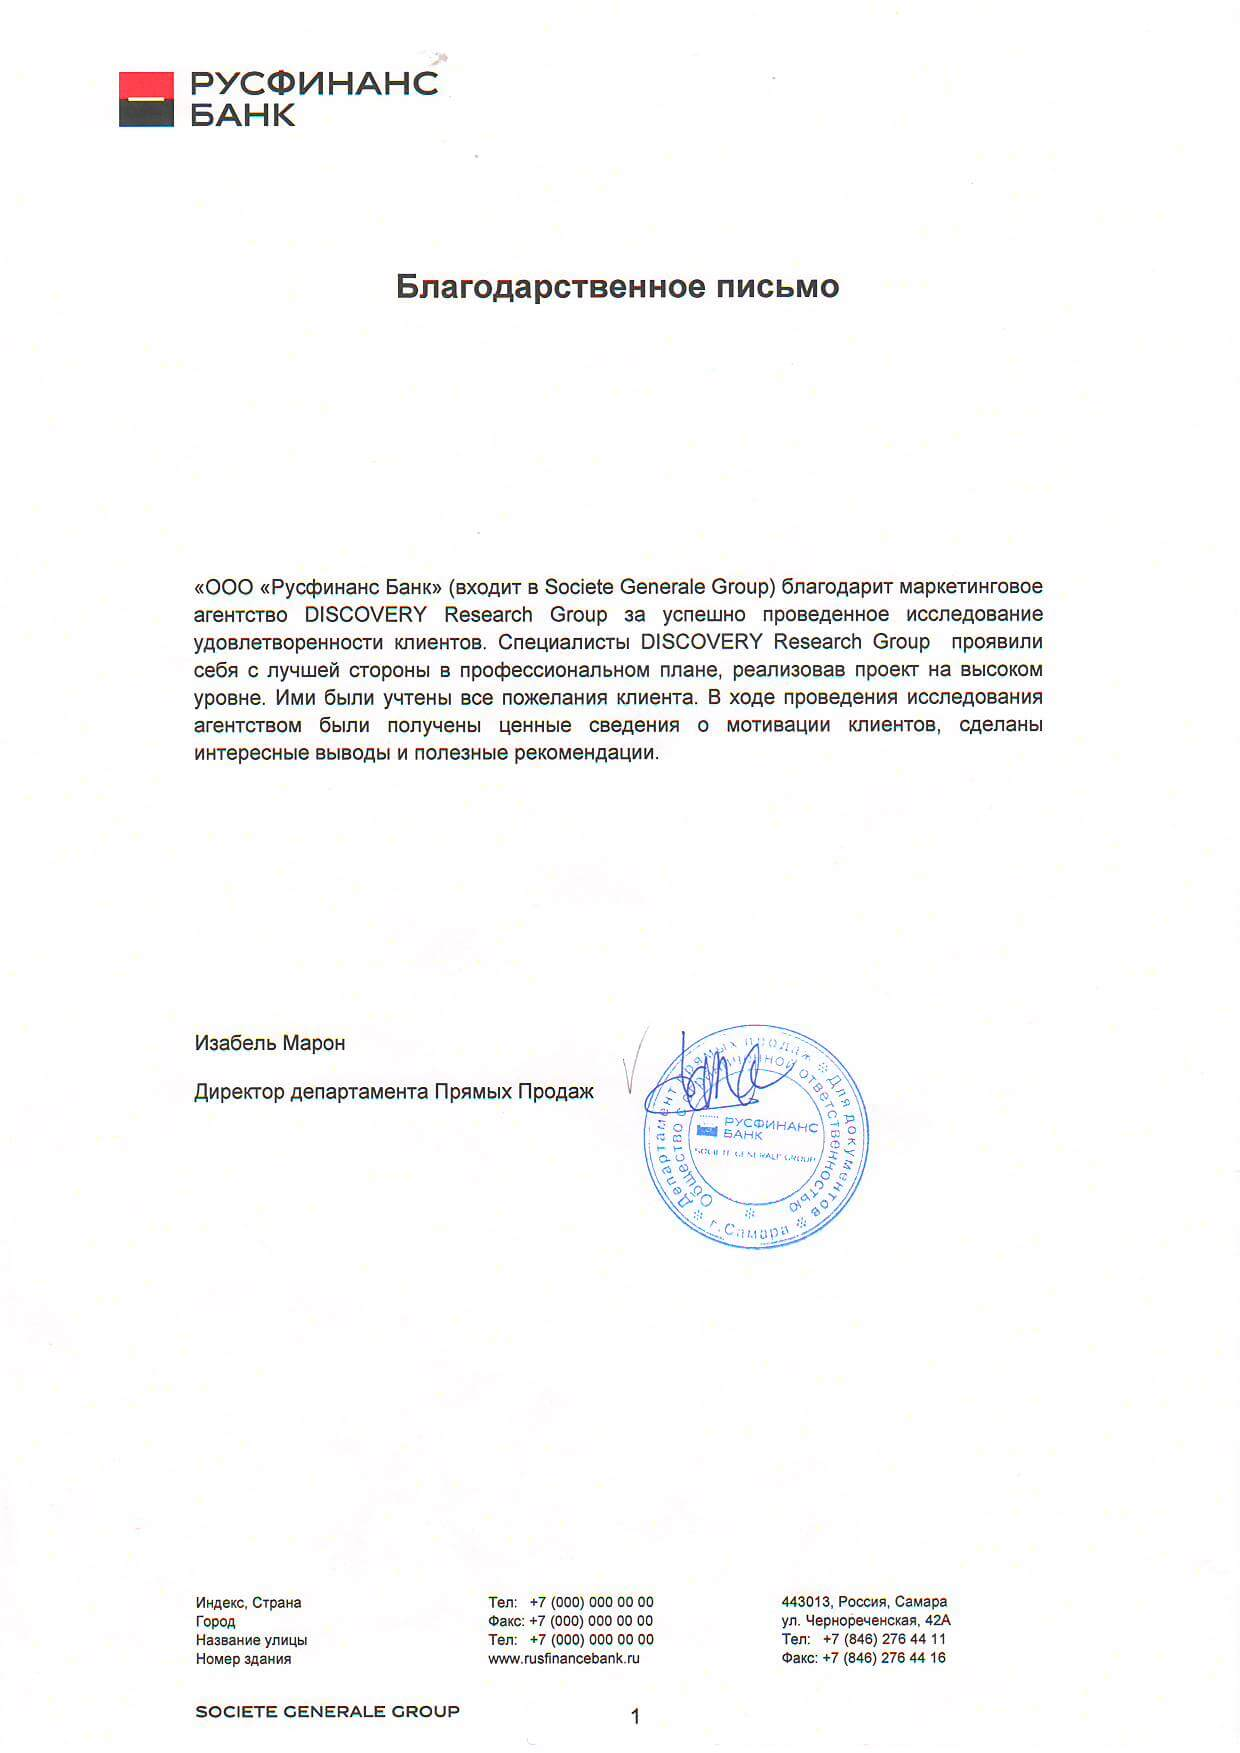 http://drgroup.ru/images/otzivi/Rusfinansbank.jpg